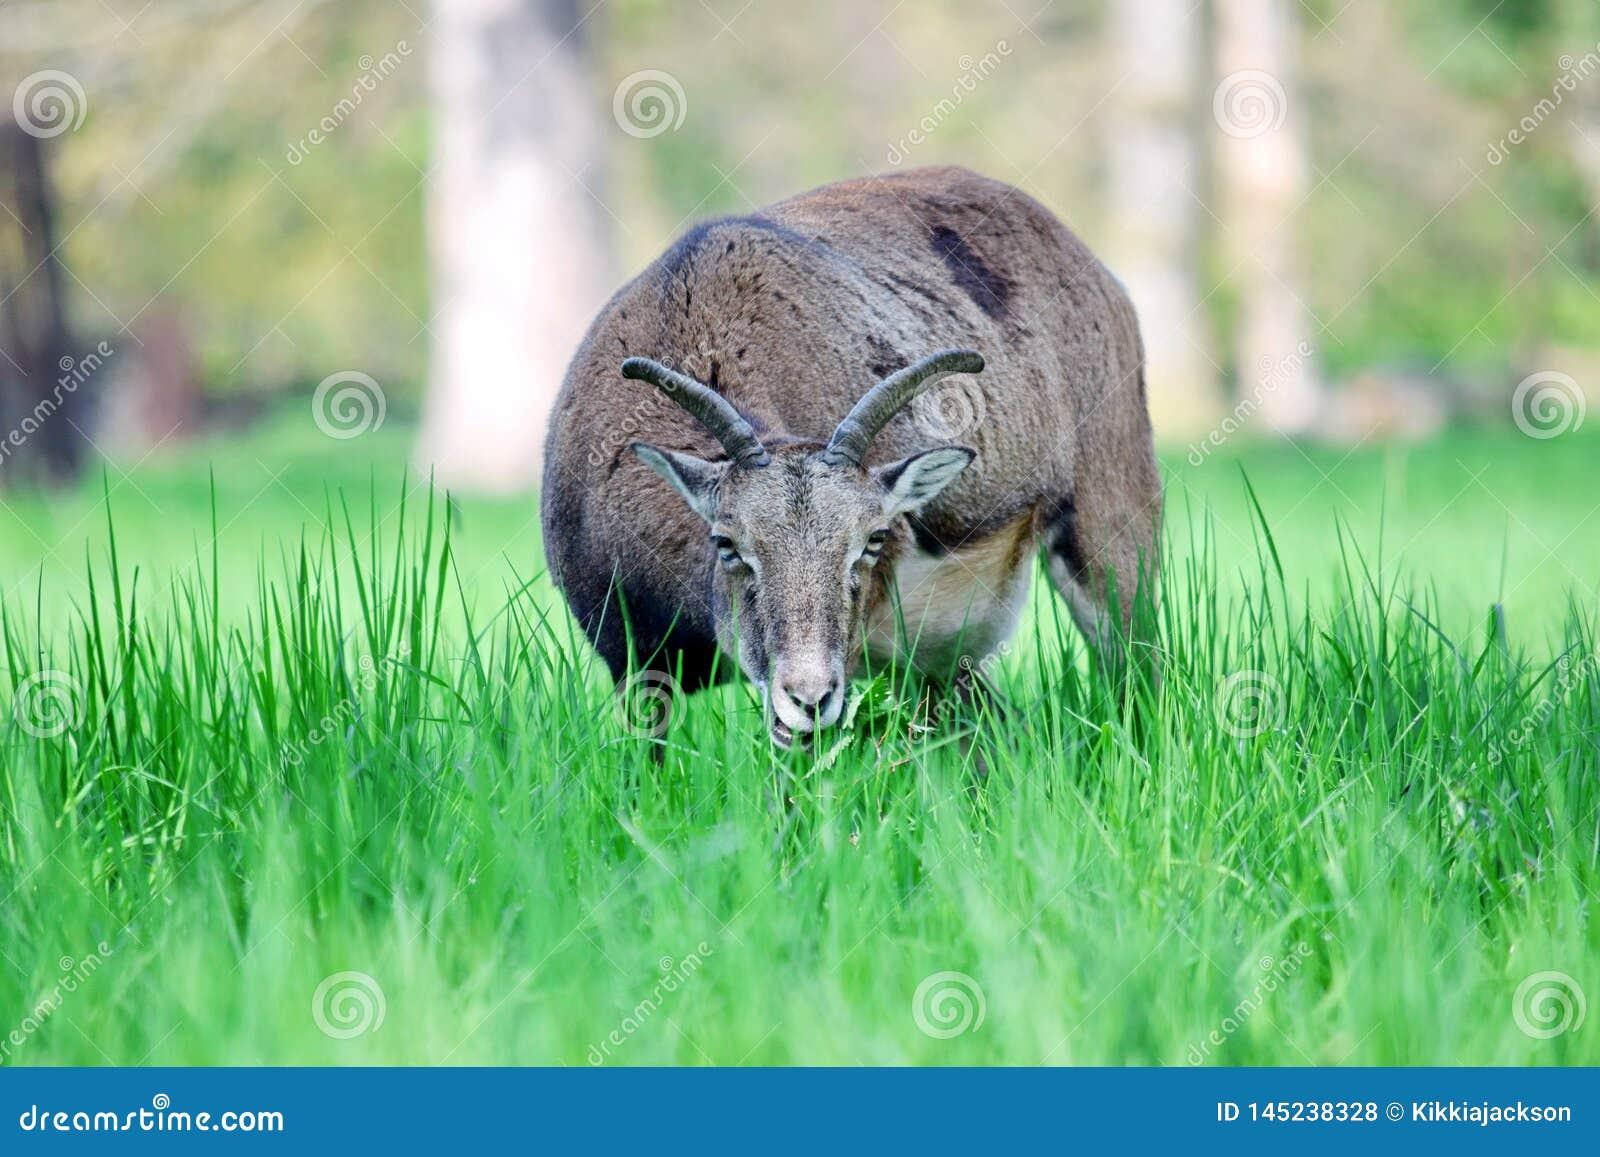 Mouflon Ovis Aries Musimon Eating Grass Closeup